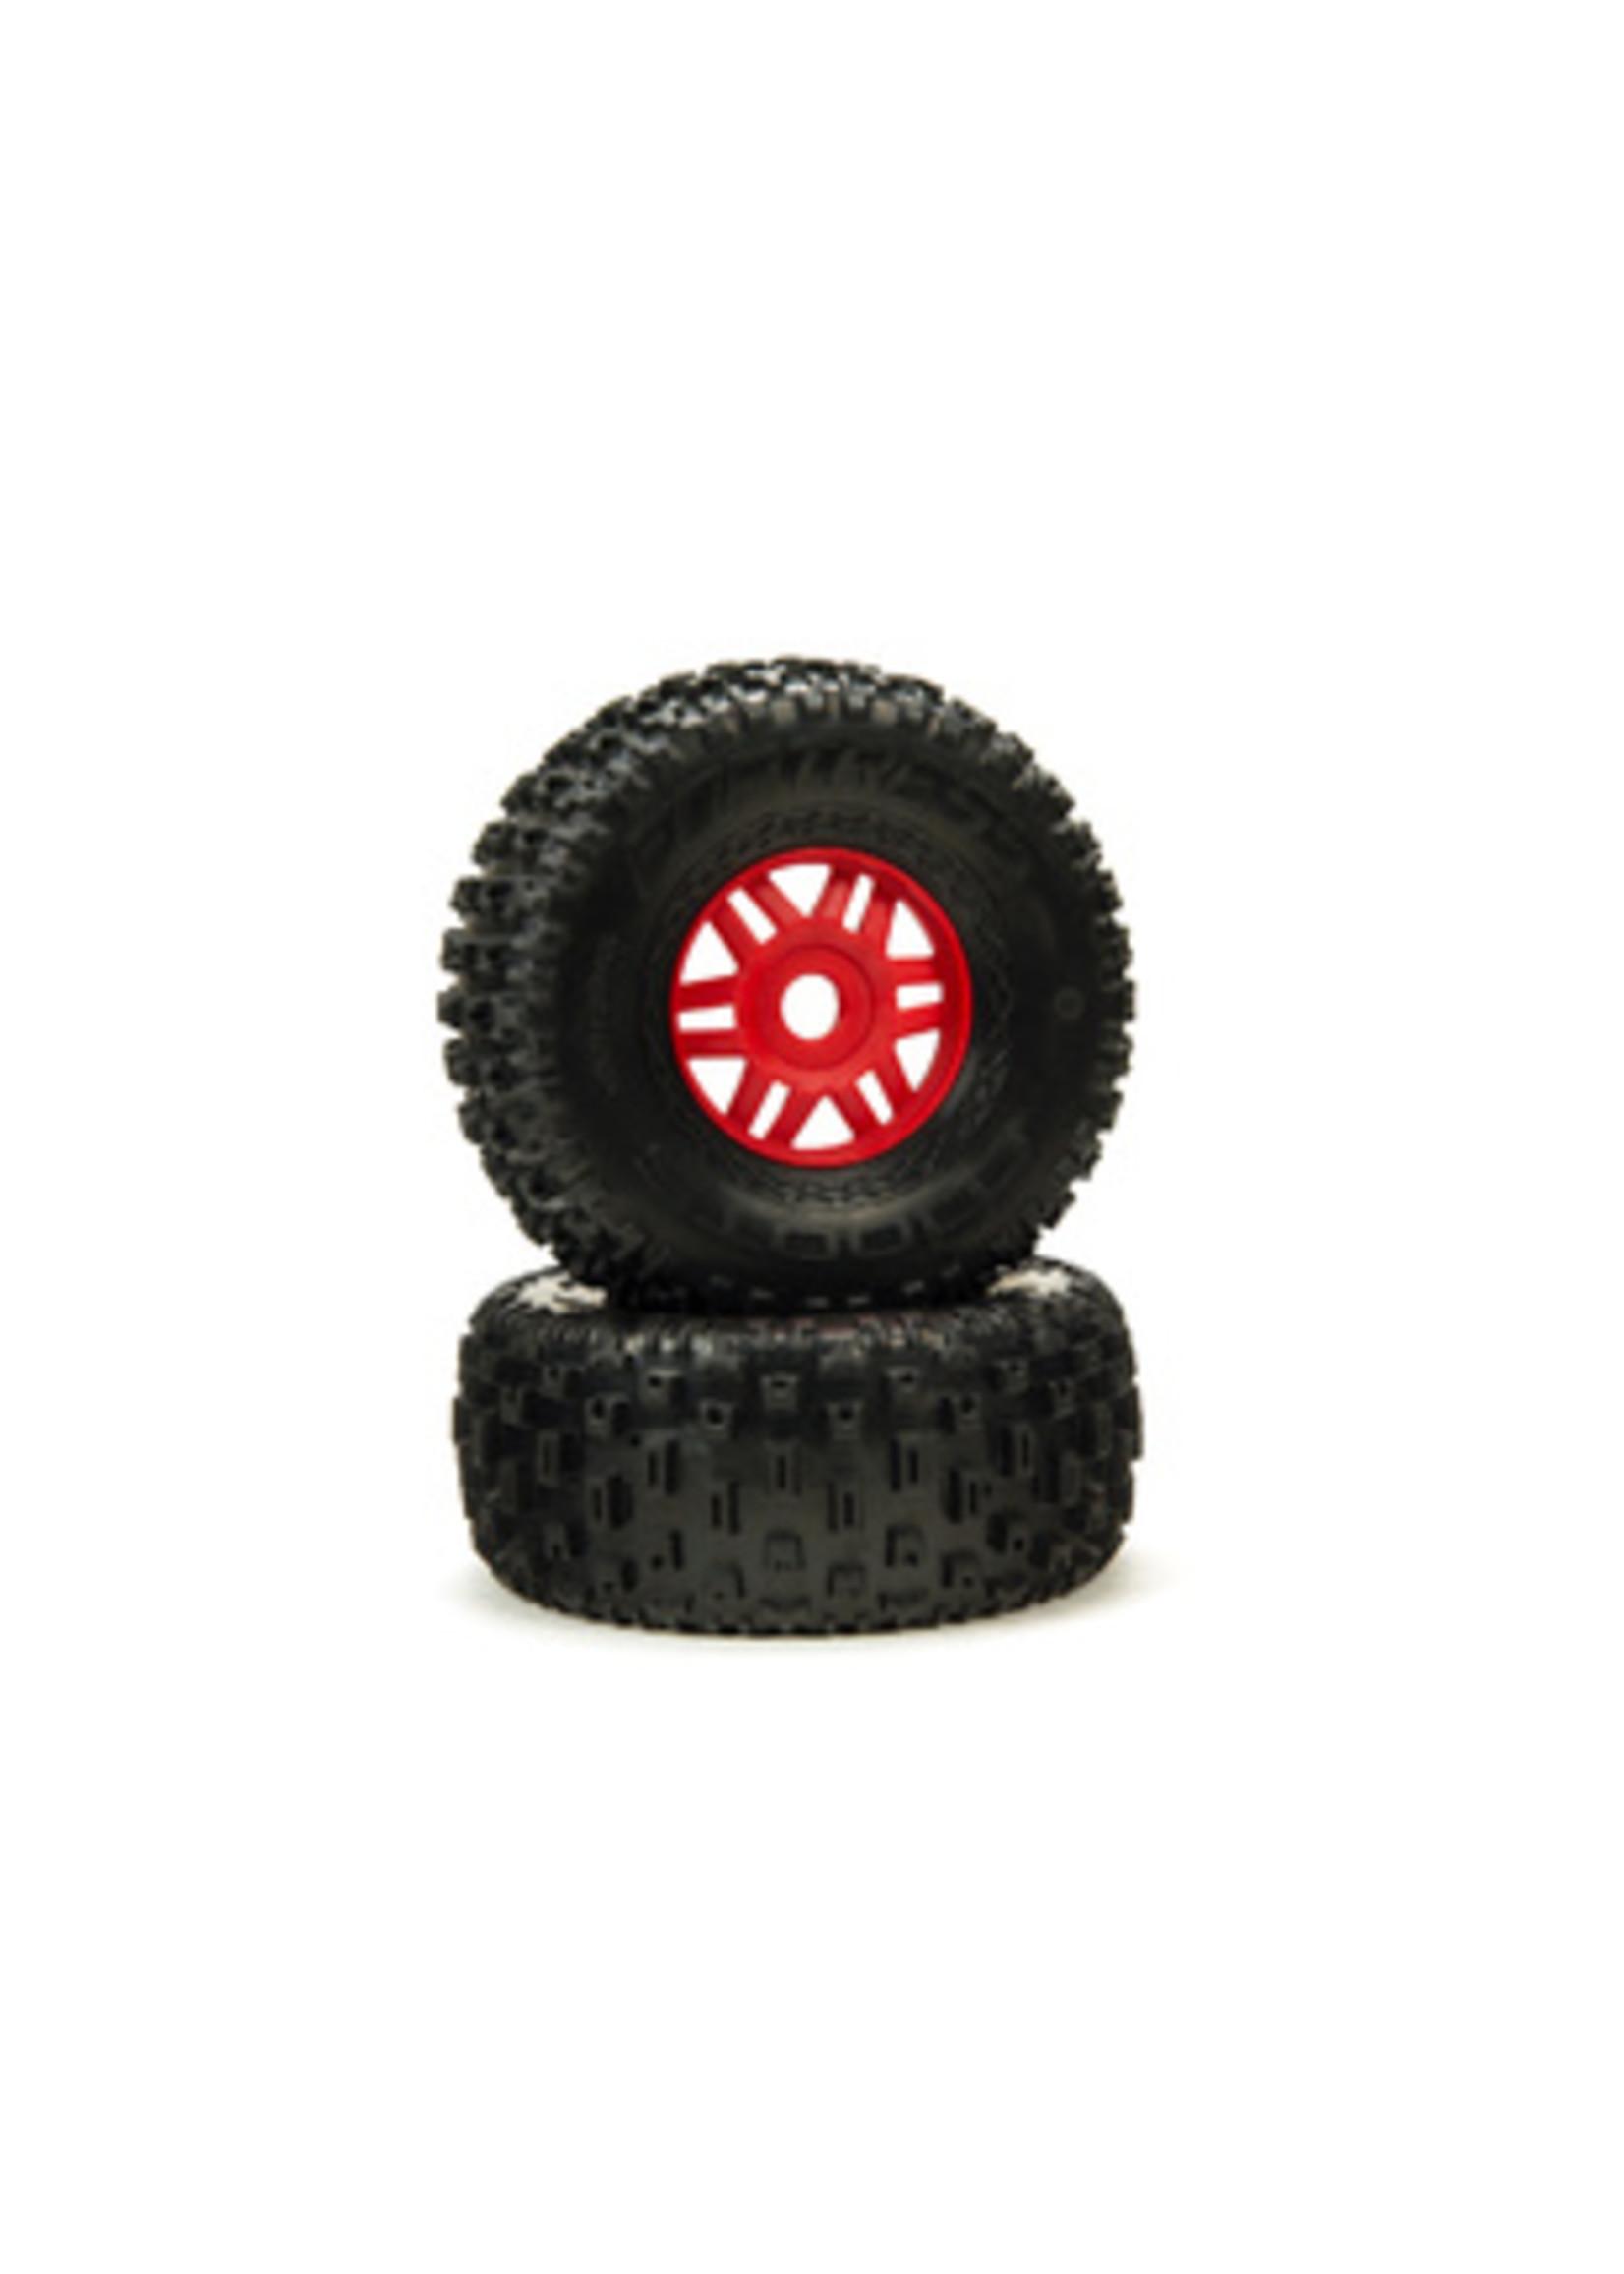 ARRMA ARA550065 Arrrma DBOOTS 'Fortress' Tire Set Glued (Red) (2pcs)